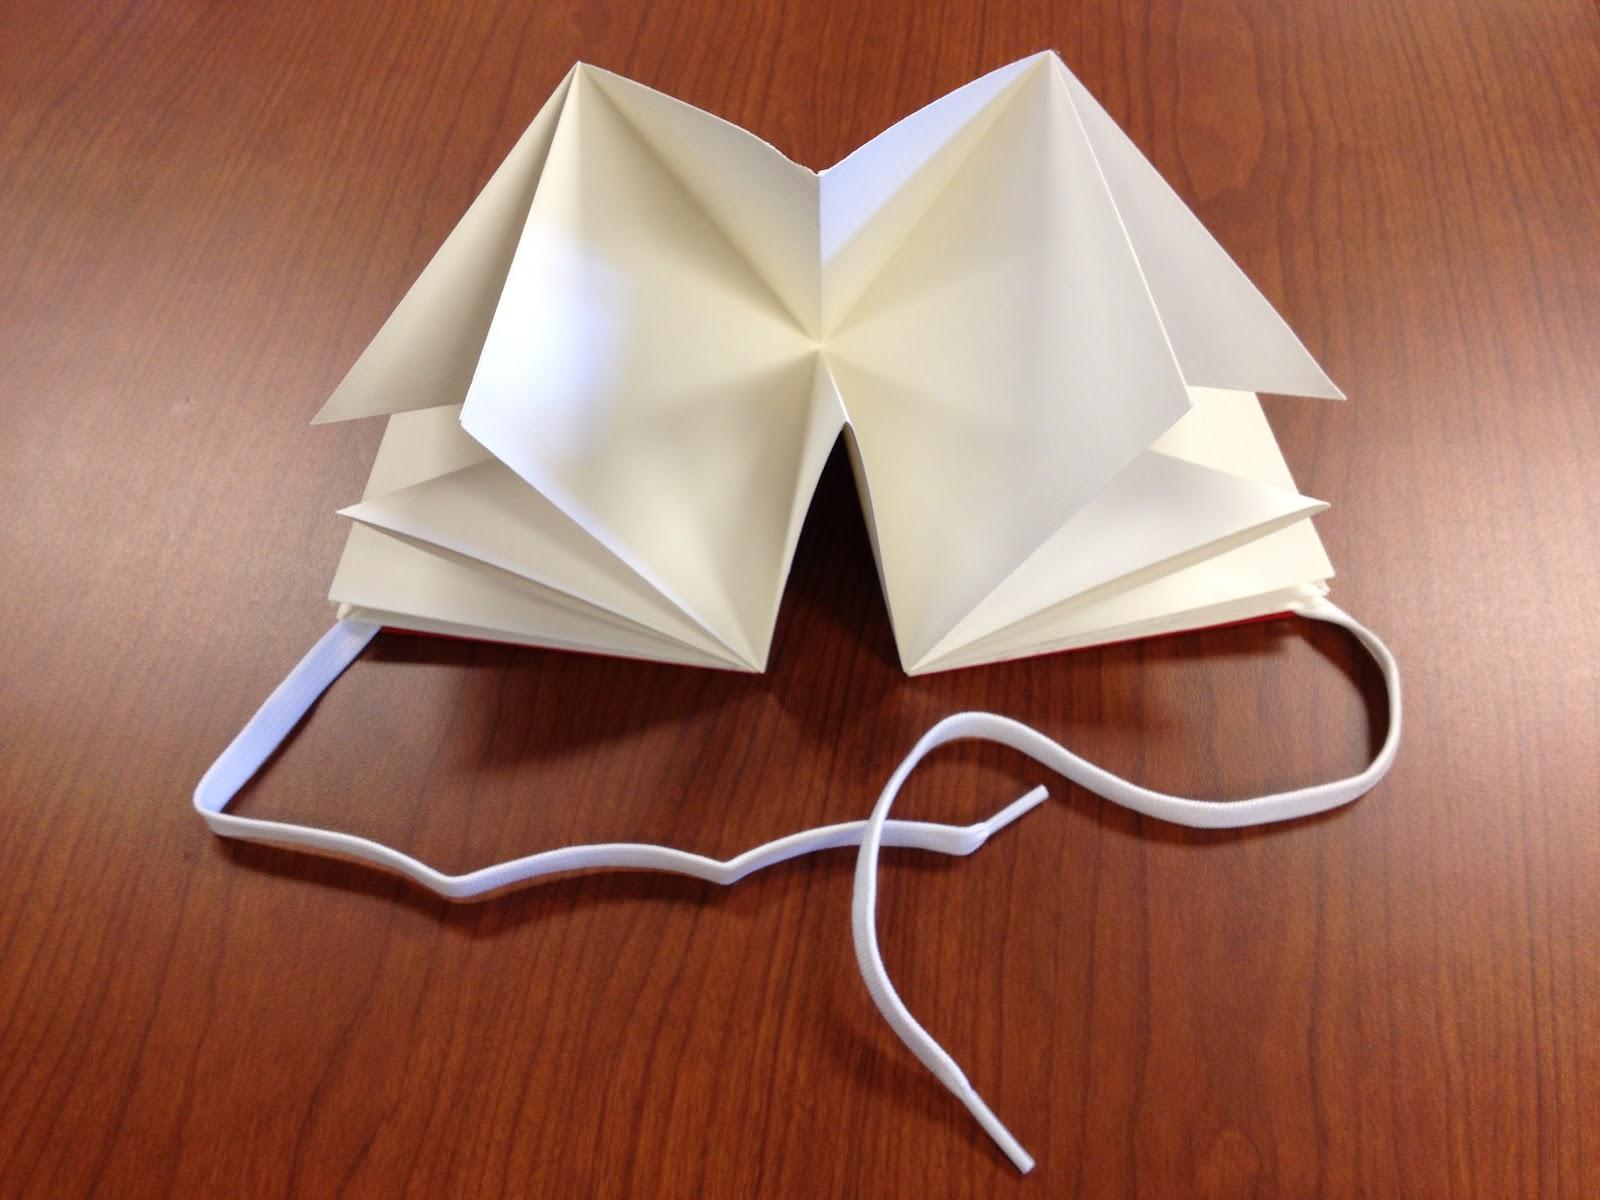 Origami lotus book teachkidsart izmirmasajfo Image collections